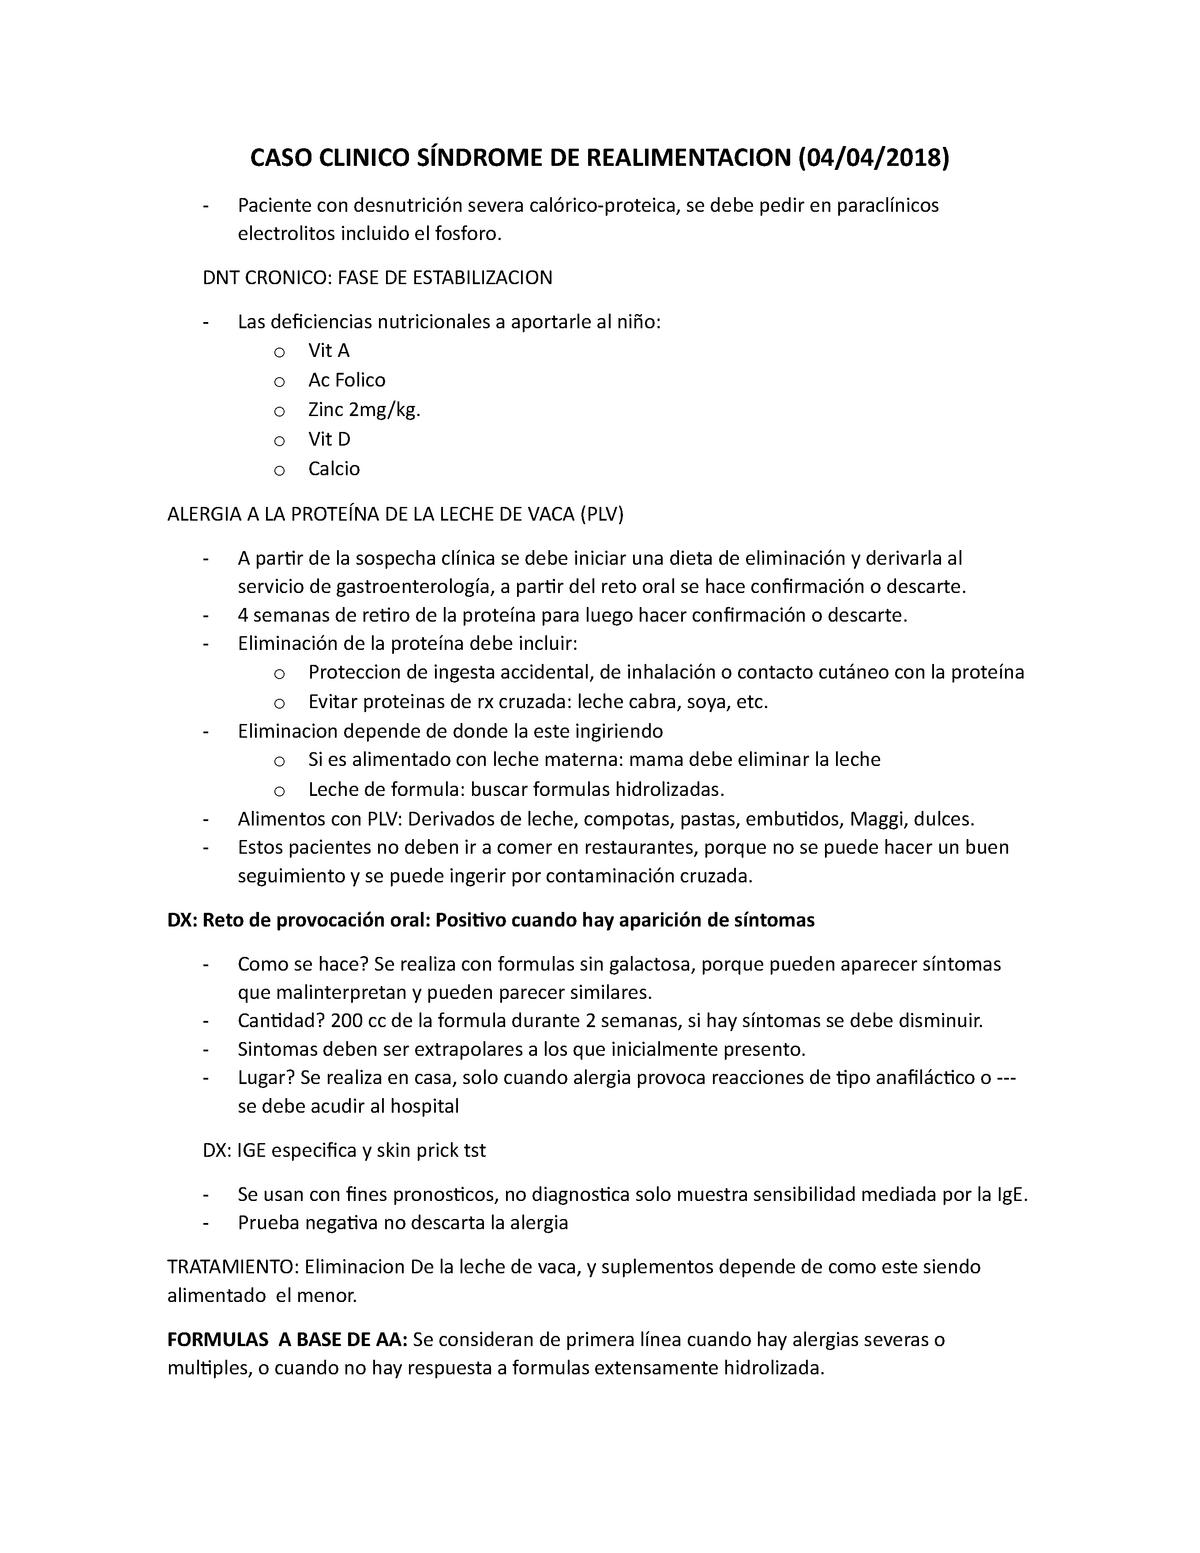 Resumen 22918 22918 18 Aug 2018 - StuDocu